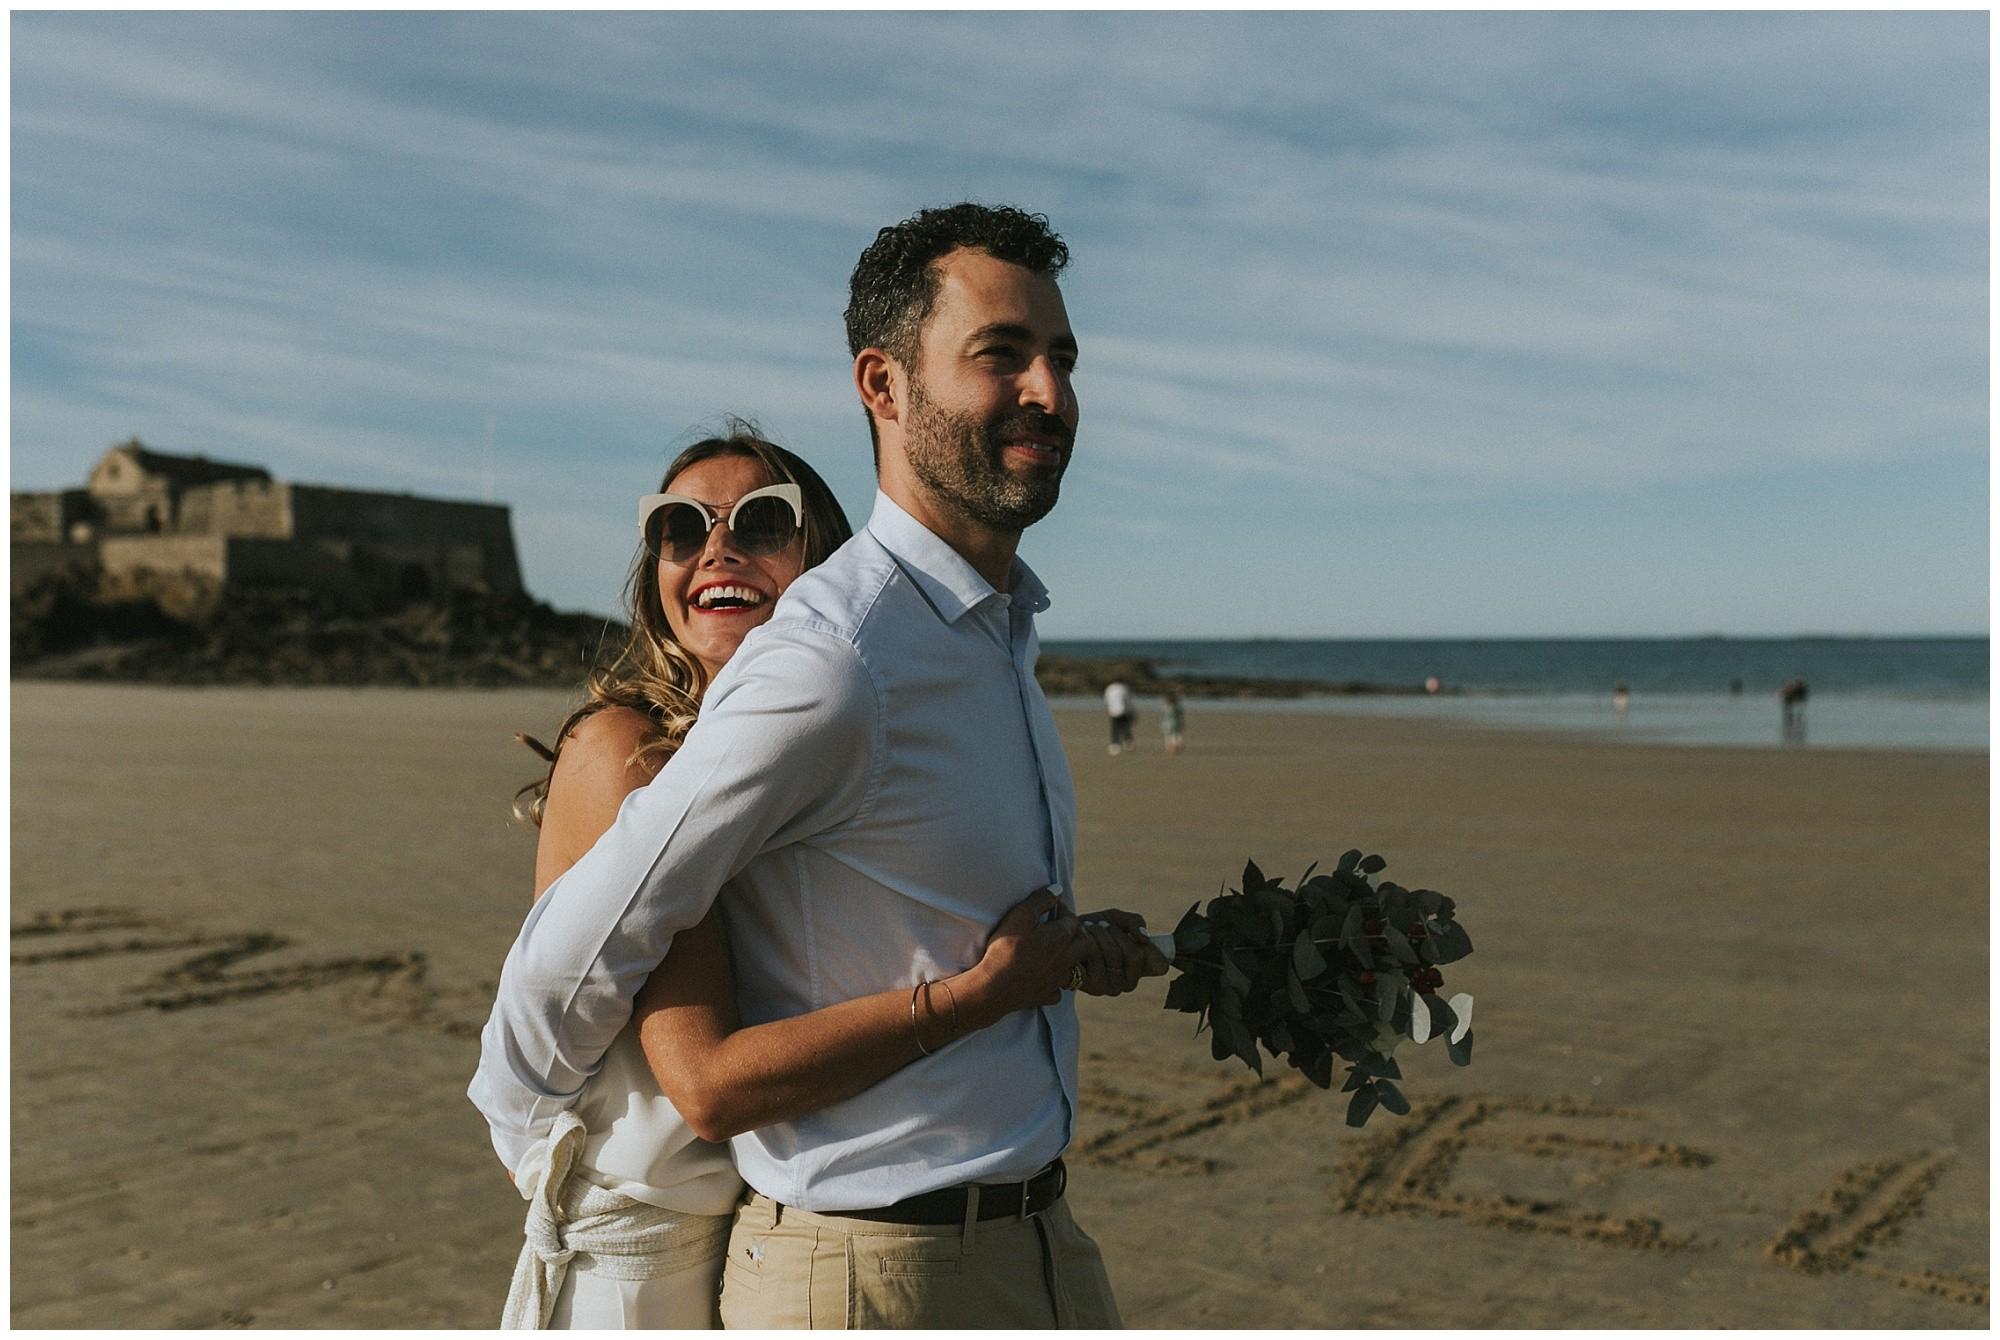 Kateryna-photos-photographe-mariage-bretagne-saint-malo-finistere-cotes-darmor-wedding_0070.jpg